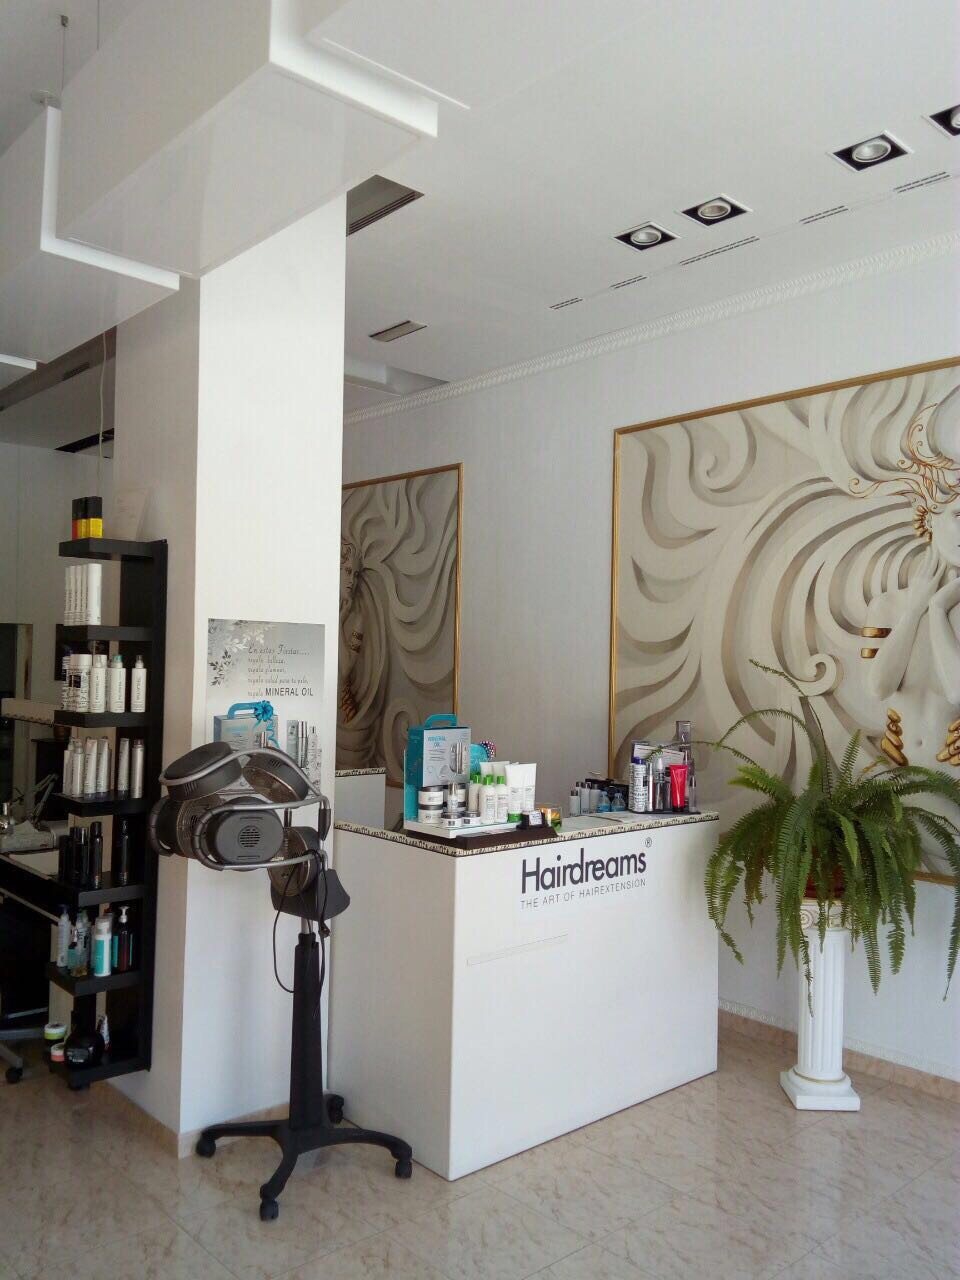 Commercial Premises for sale in Marbella - Puerto Banus